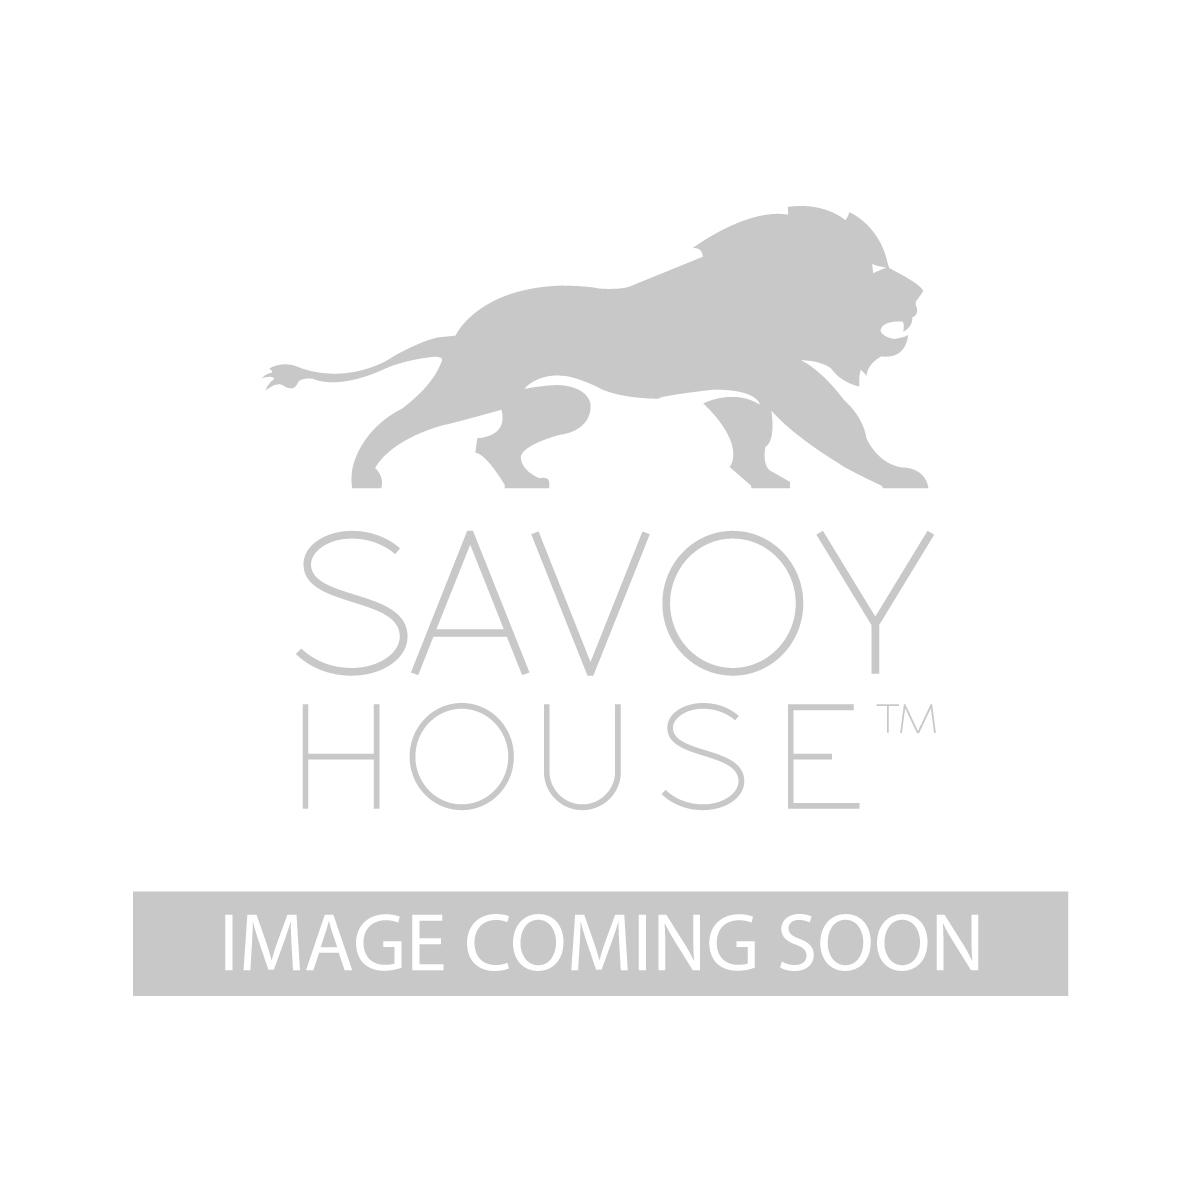 5 258 25 Monte Grande Wall Mount Lantern By Savoy House